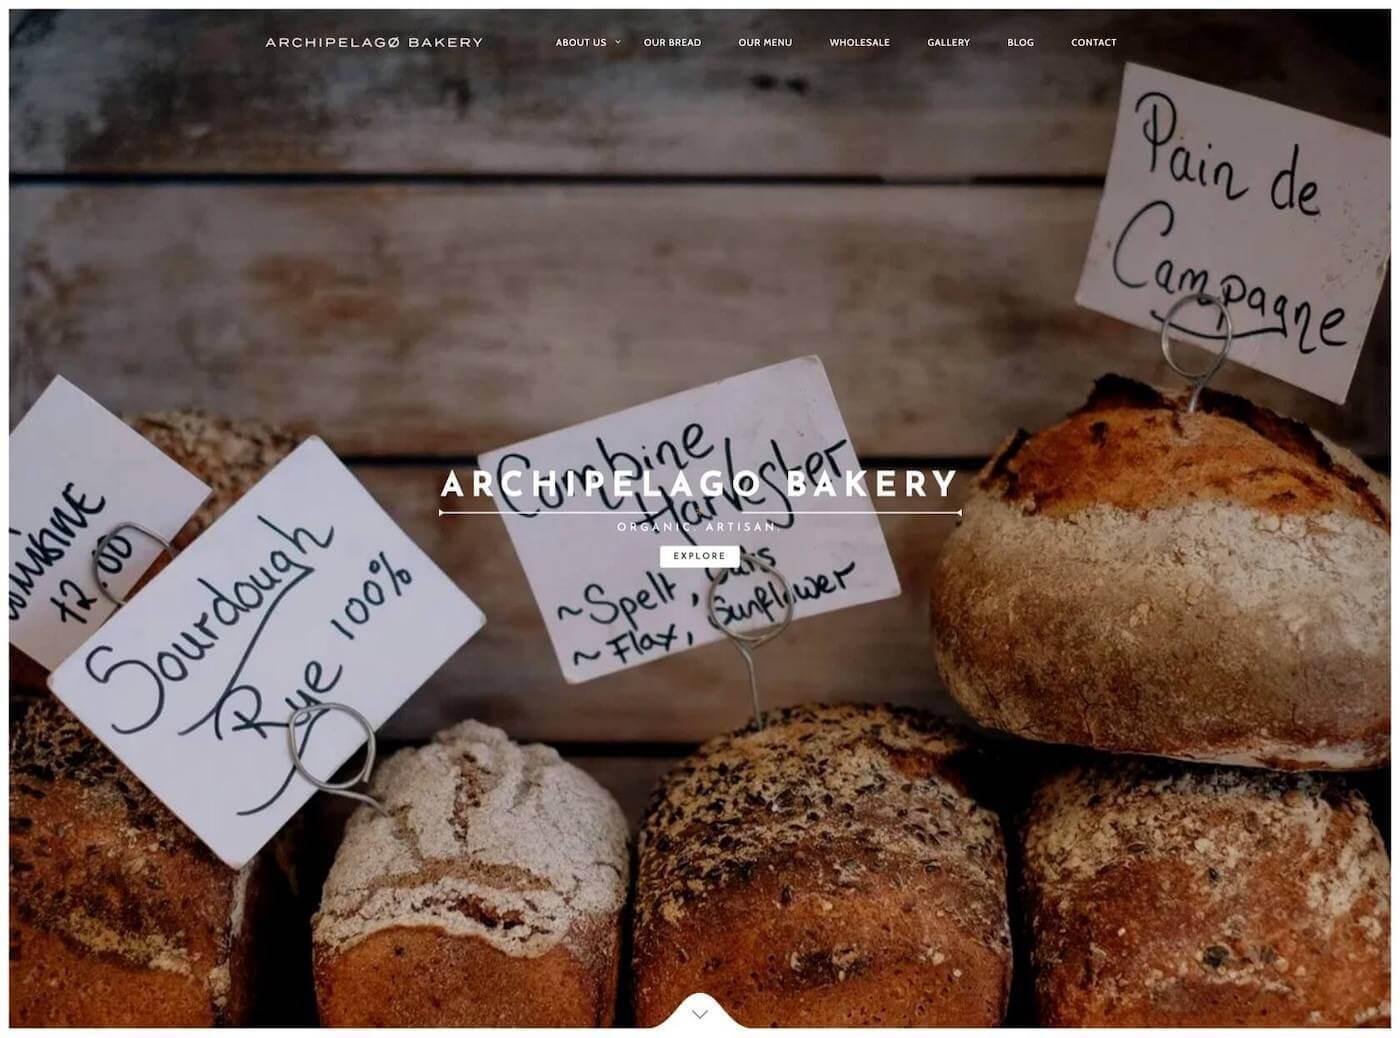 Web design for Archipelago Bakery, Edinburgh